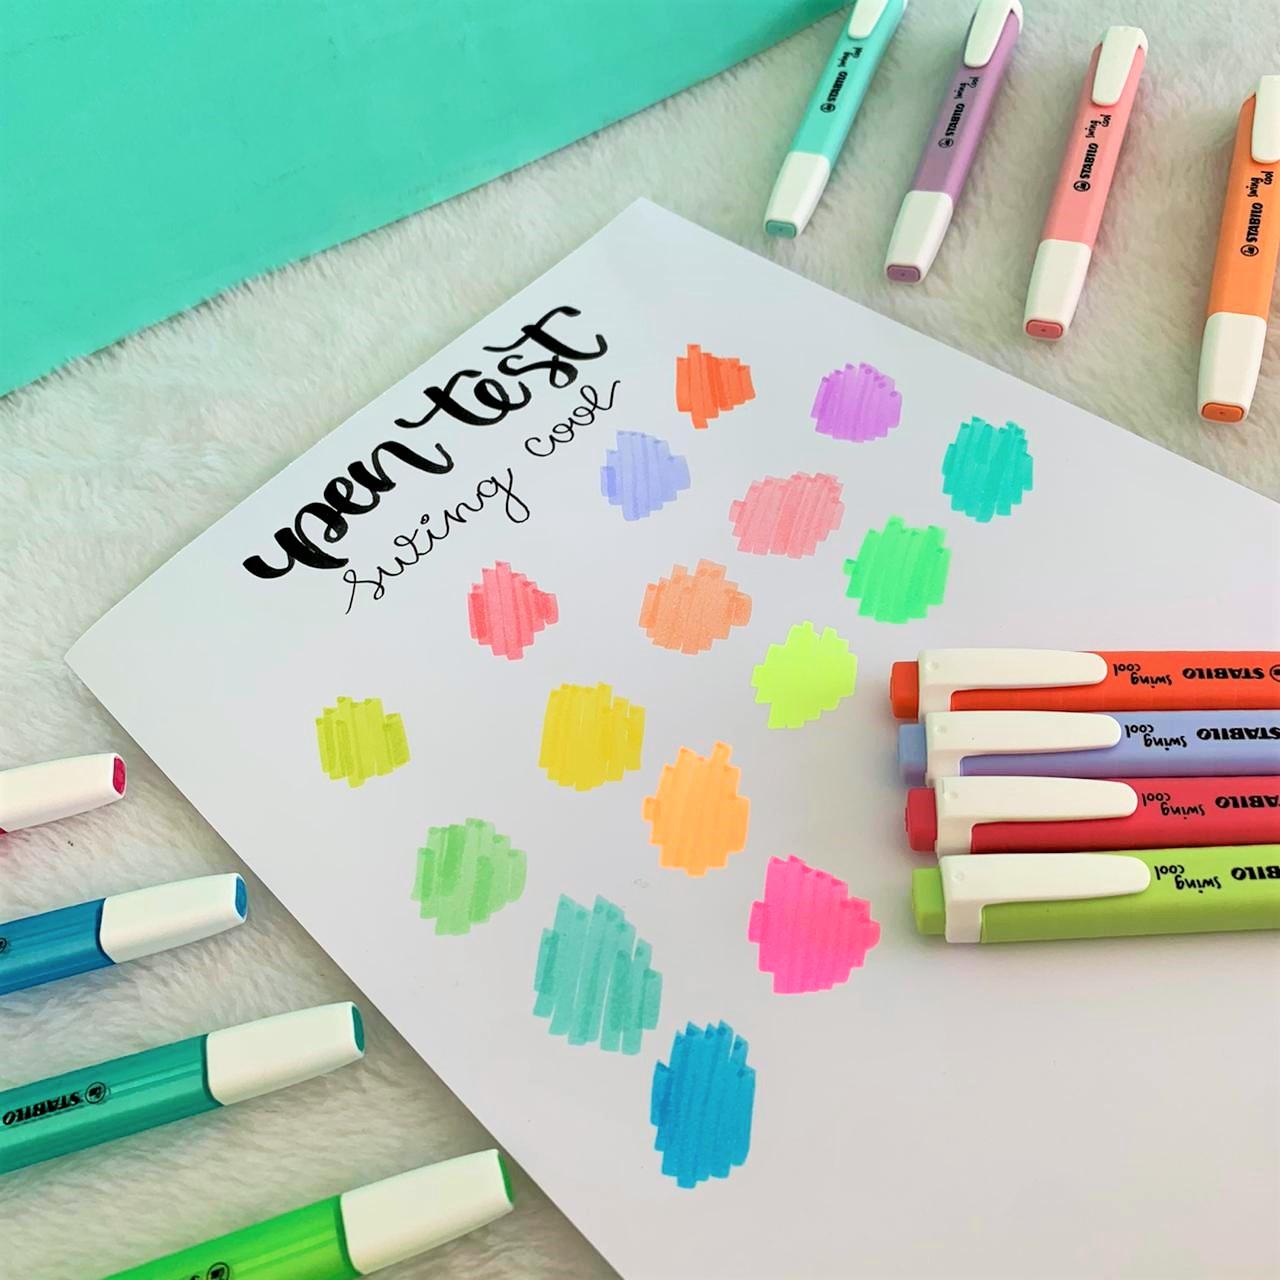 Kit Marca Texto Swing Cool com 4 cores Pastéis| Stabilo